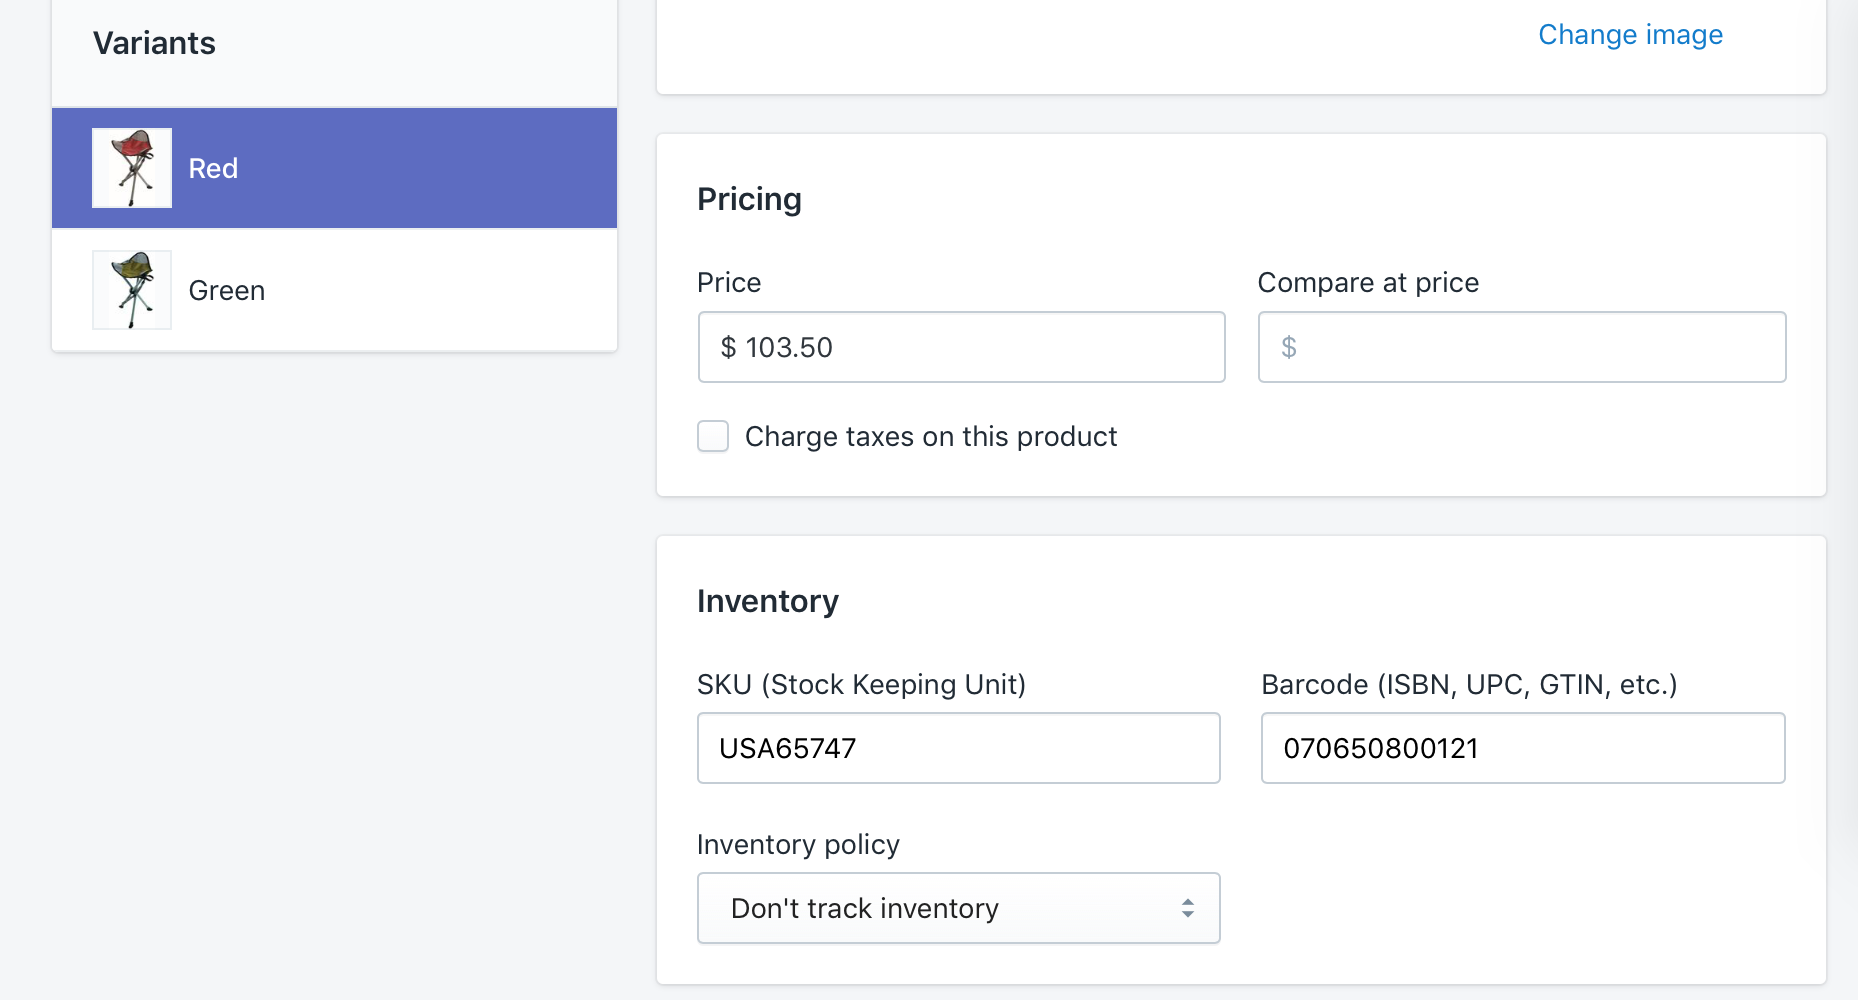 Product SKU and Barcode